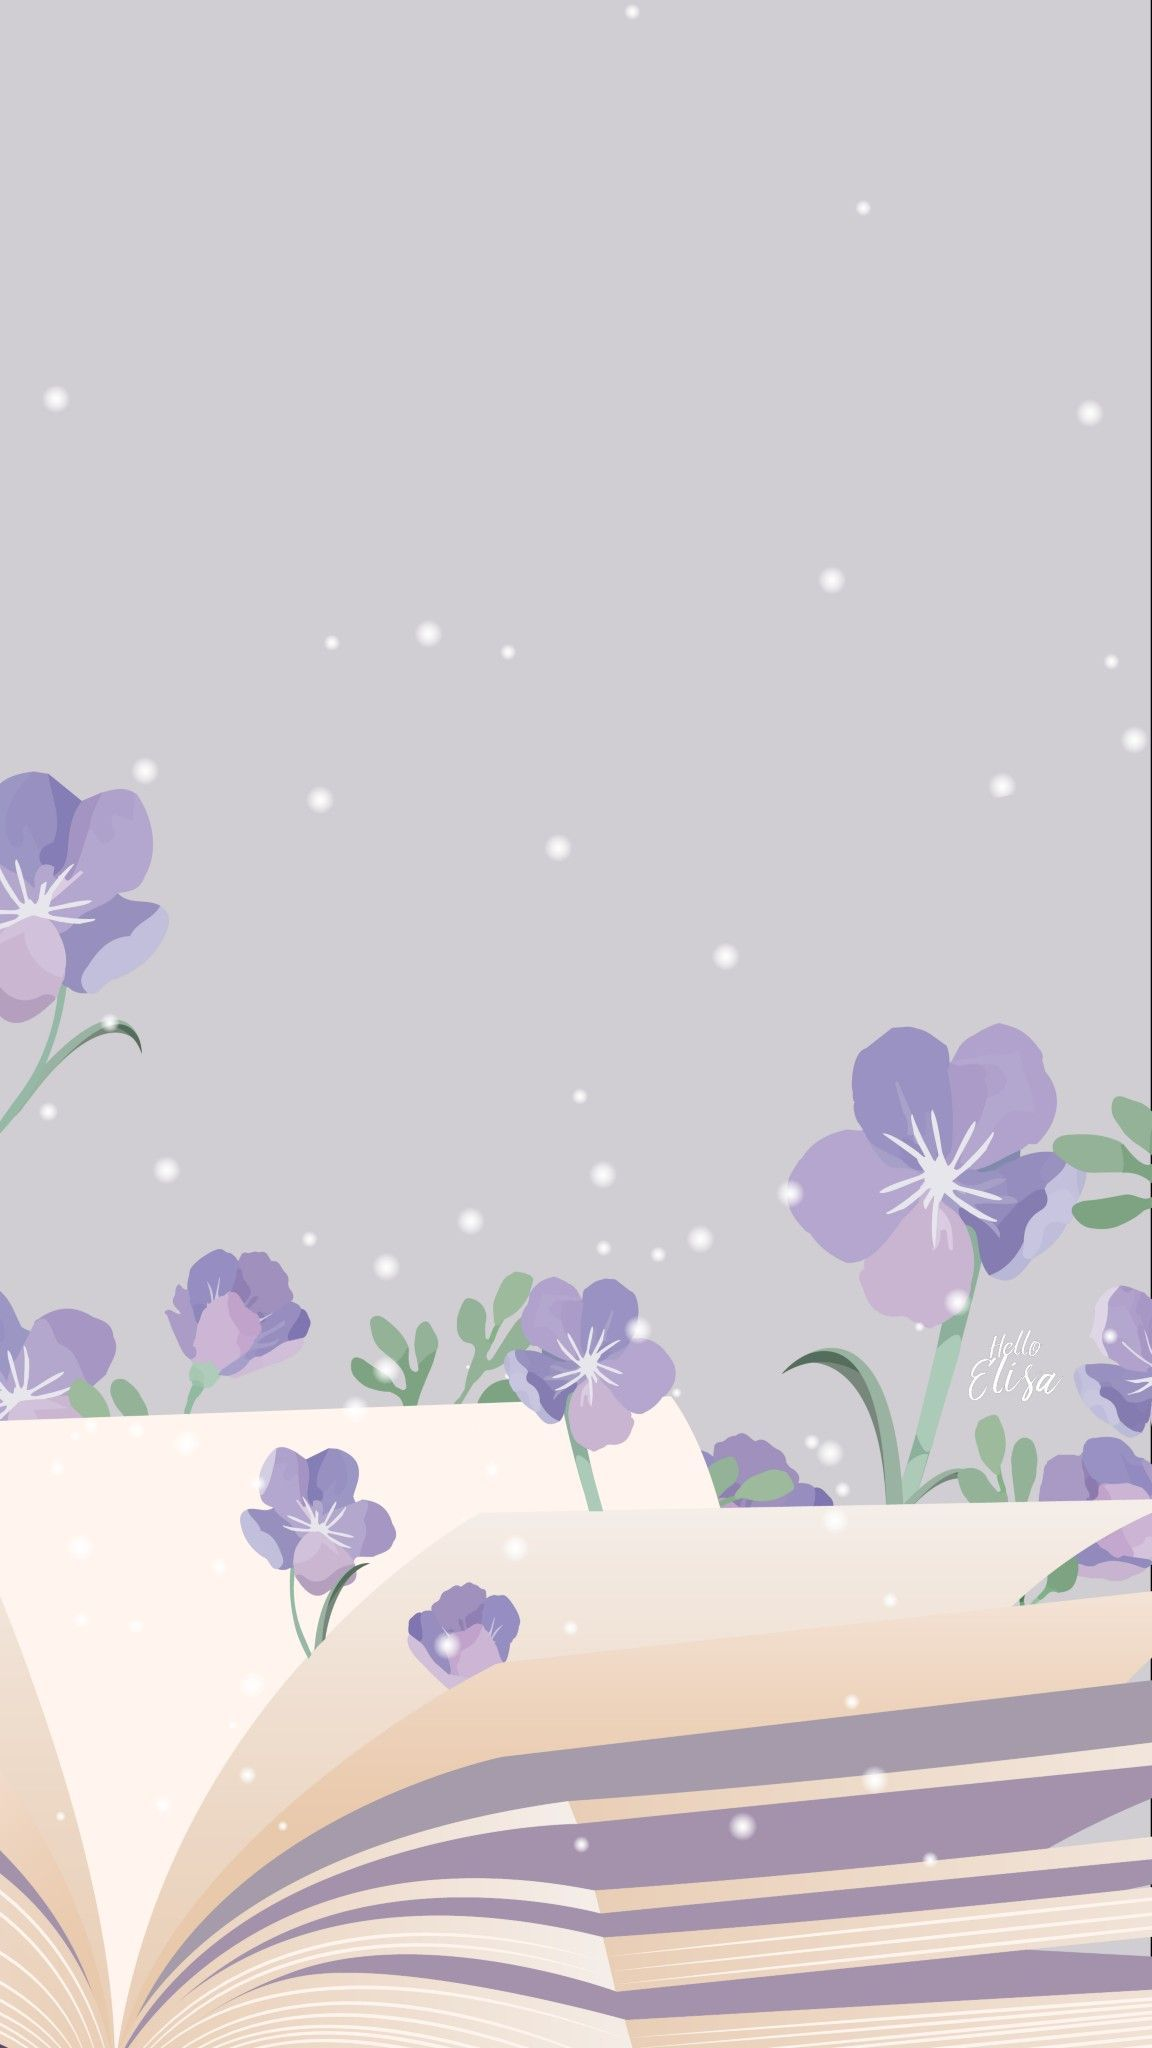 Get Nice Simple Anime Wallpaper Iphone In 2020 Anime Wallpaper Graphic Wallpaper Cute Patterns Wallpaper